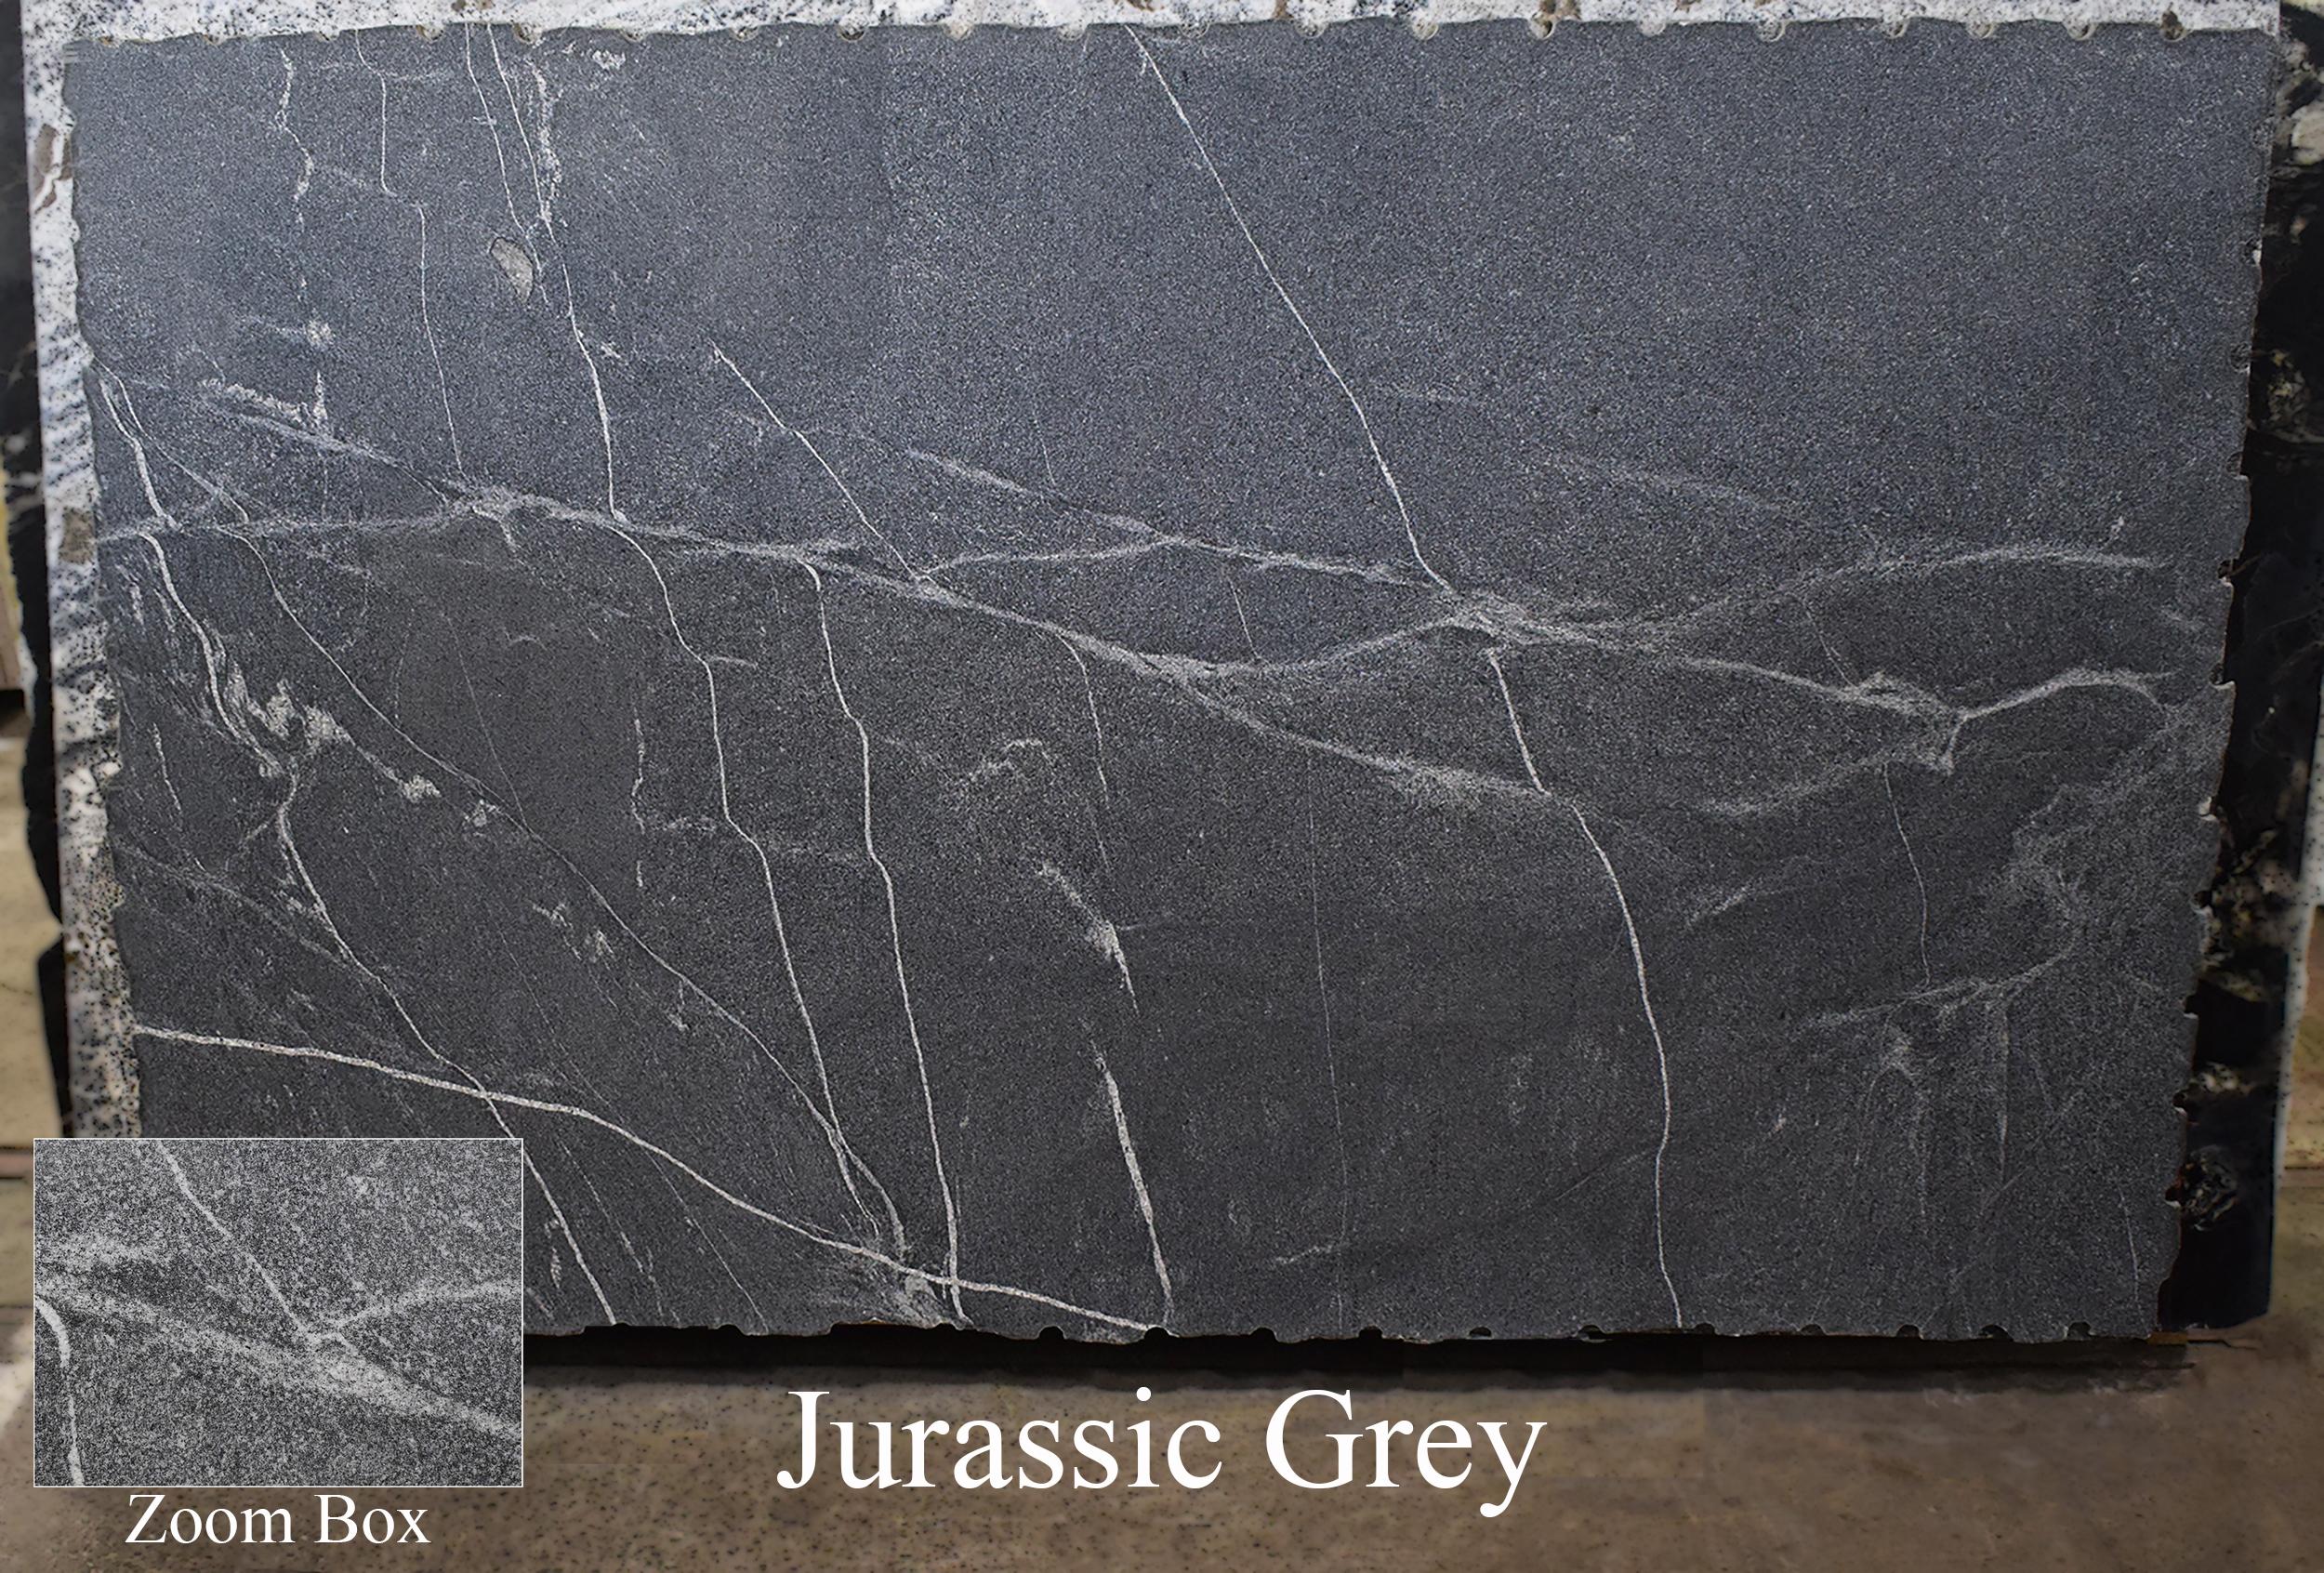 JURASSIC GREY